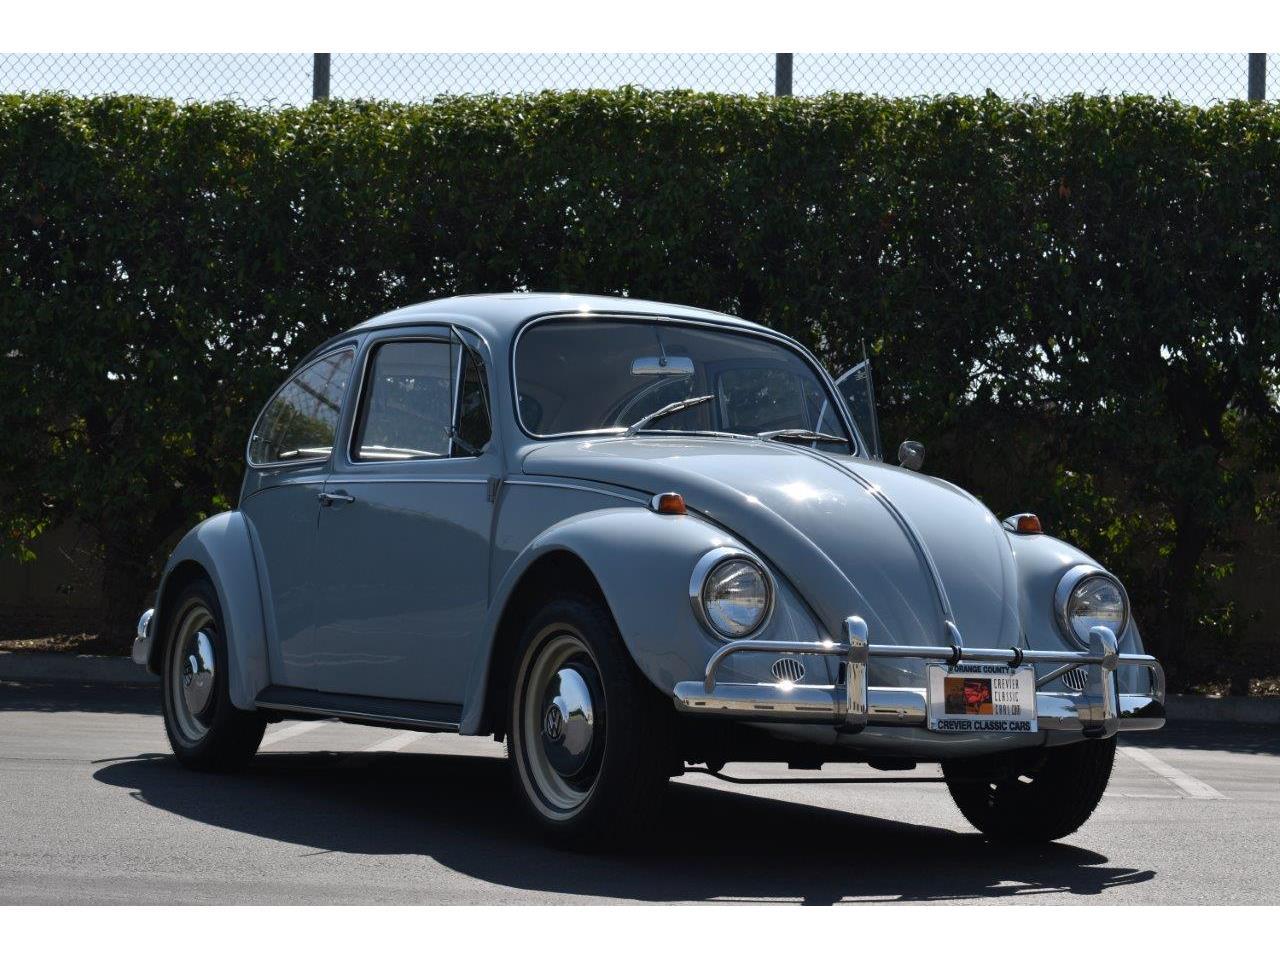 for sale 1967 volkswagen beetle in costa mesa, california cars - costa mesa, ca at geebo